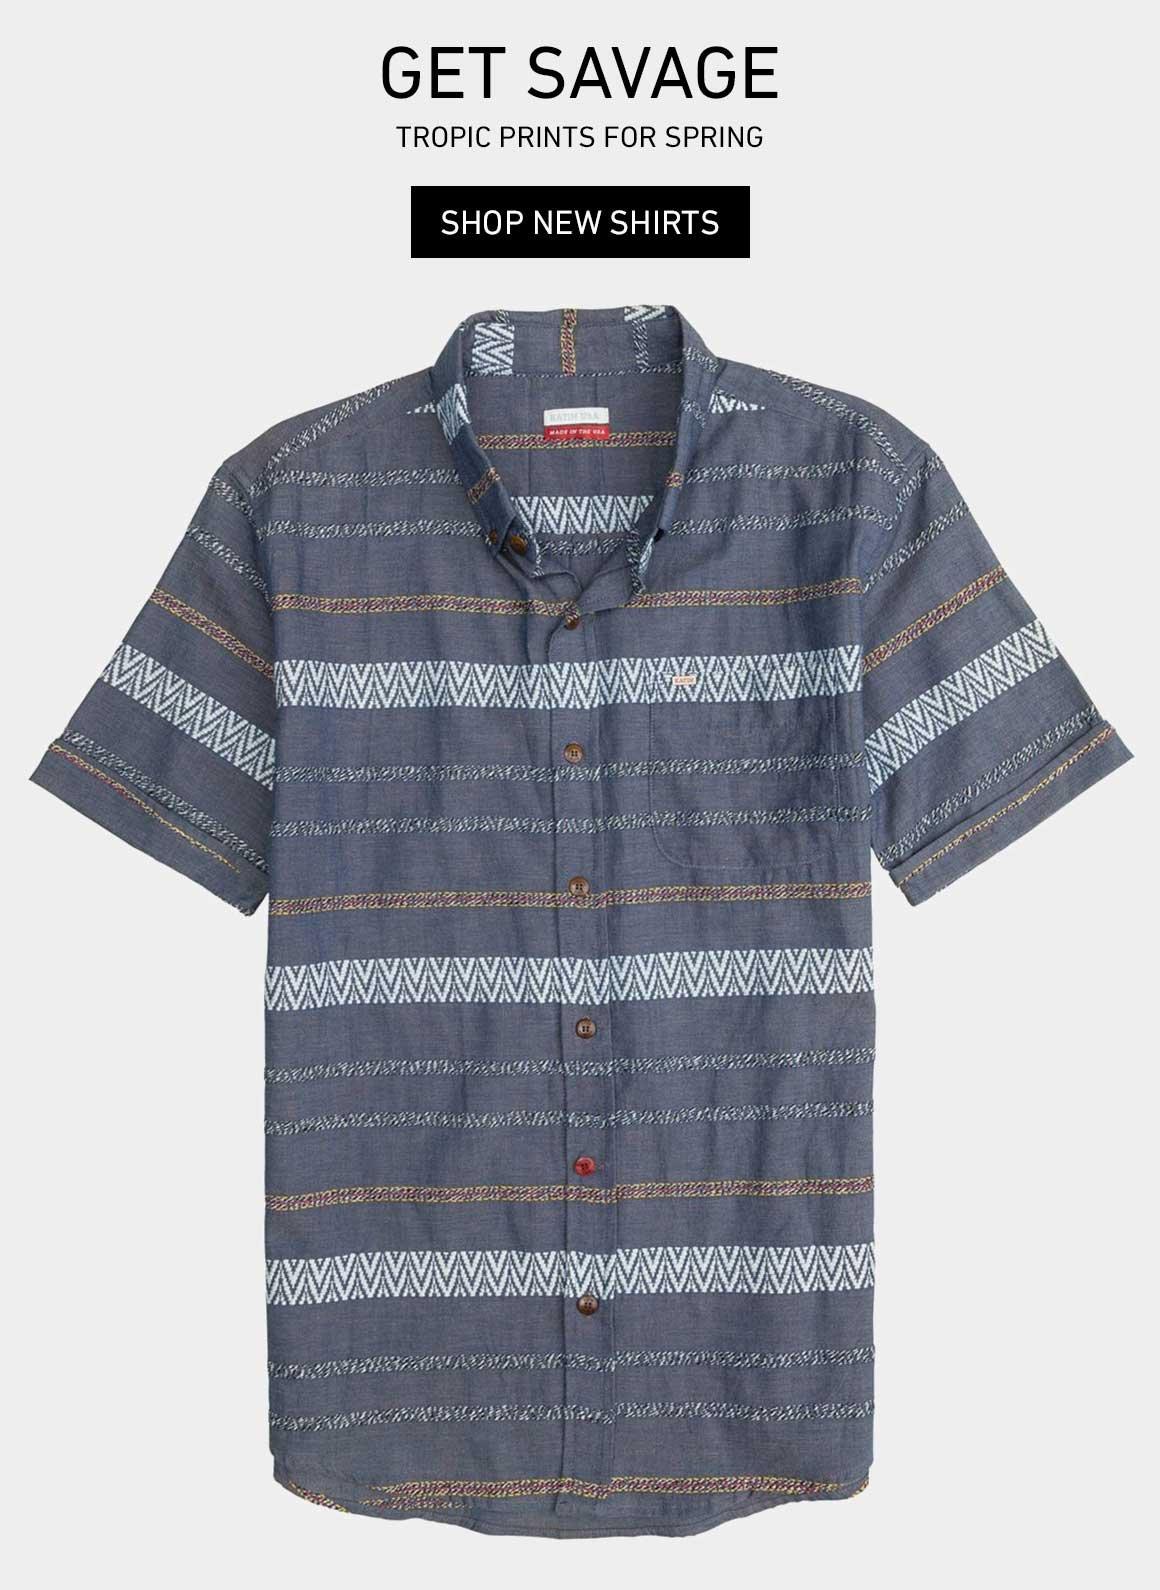 Get Savage: New Shirts